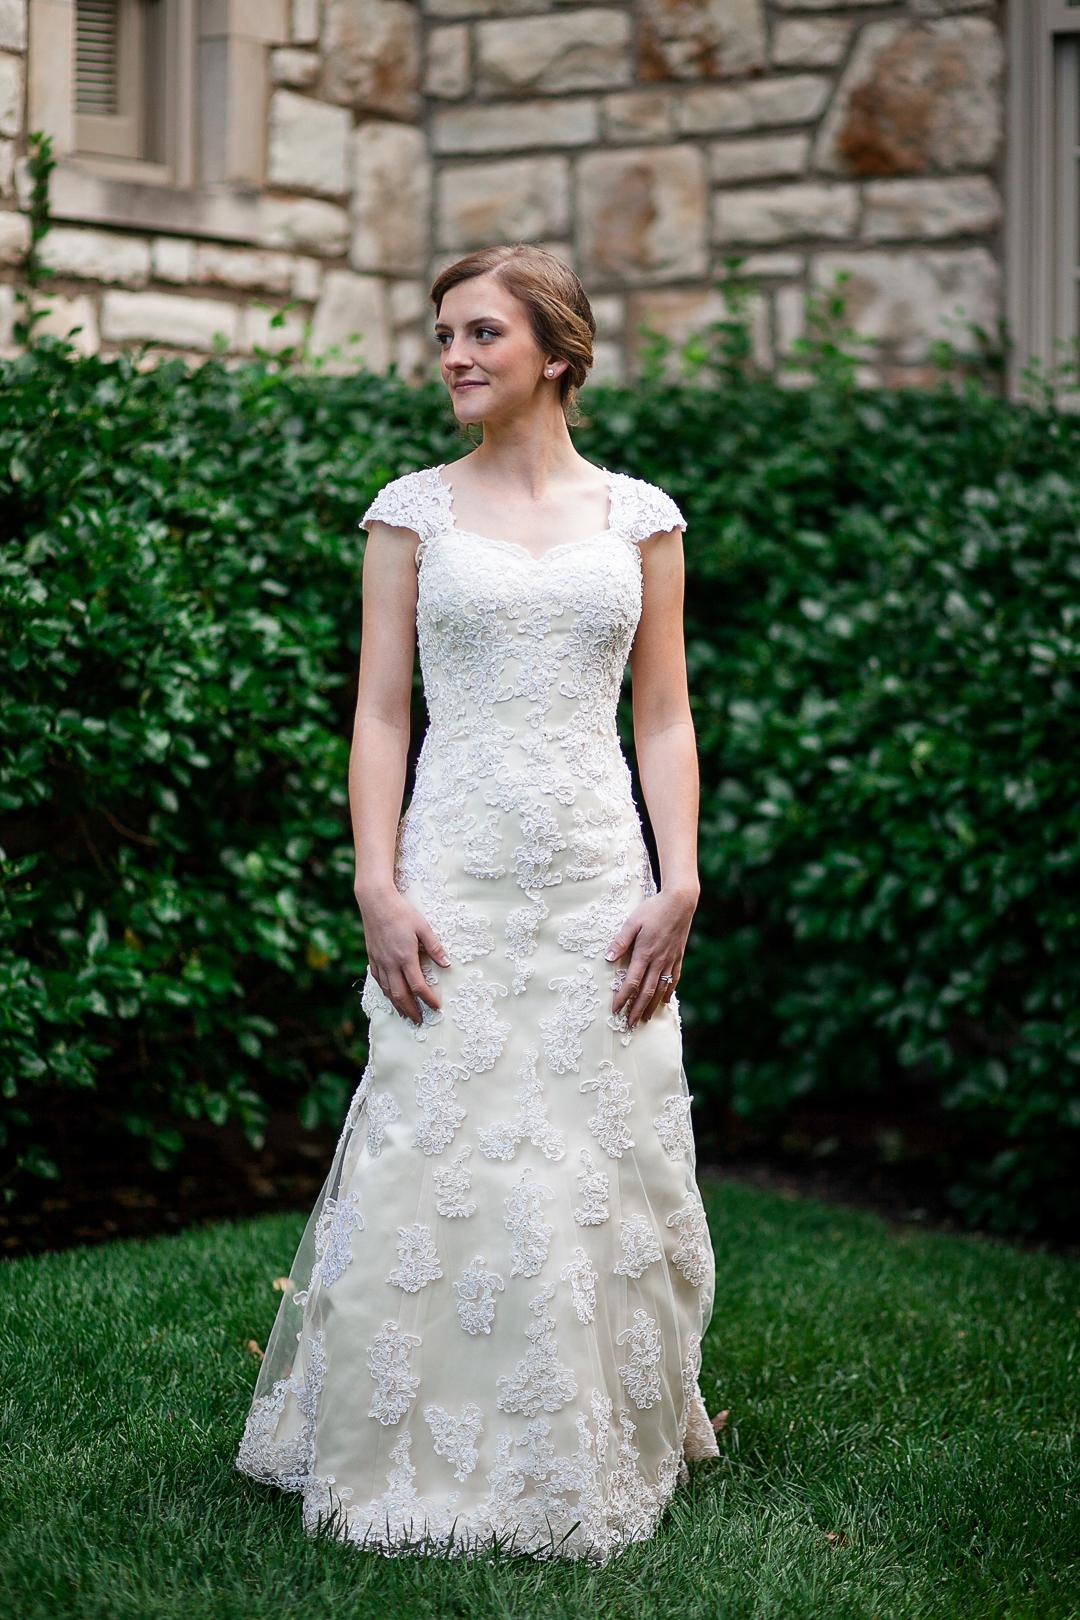 Carriage_club_kansas_city_mo_Missouri_kansas_ks_creative_wedding_photographer_best_jason_domingues_0015